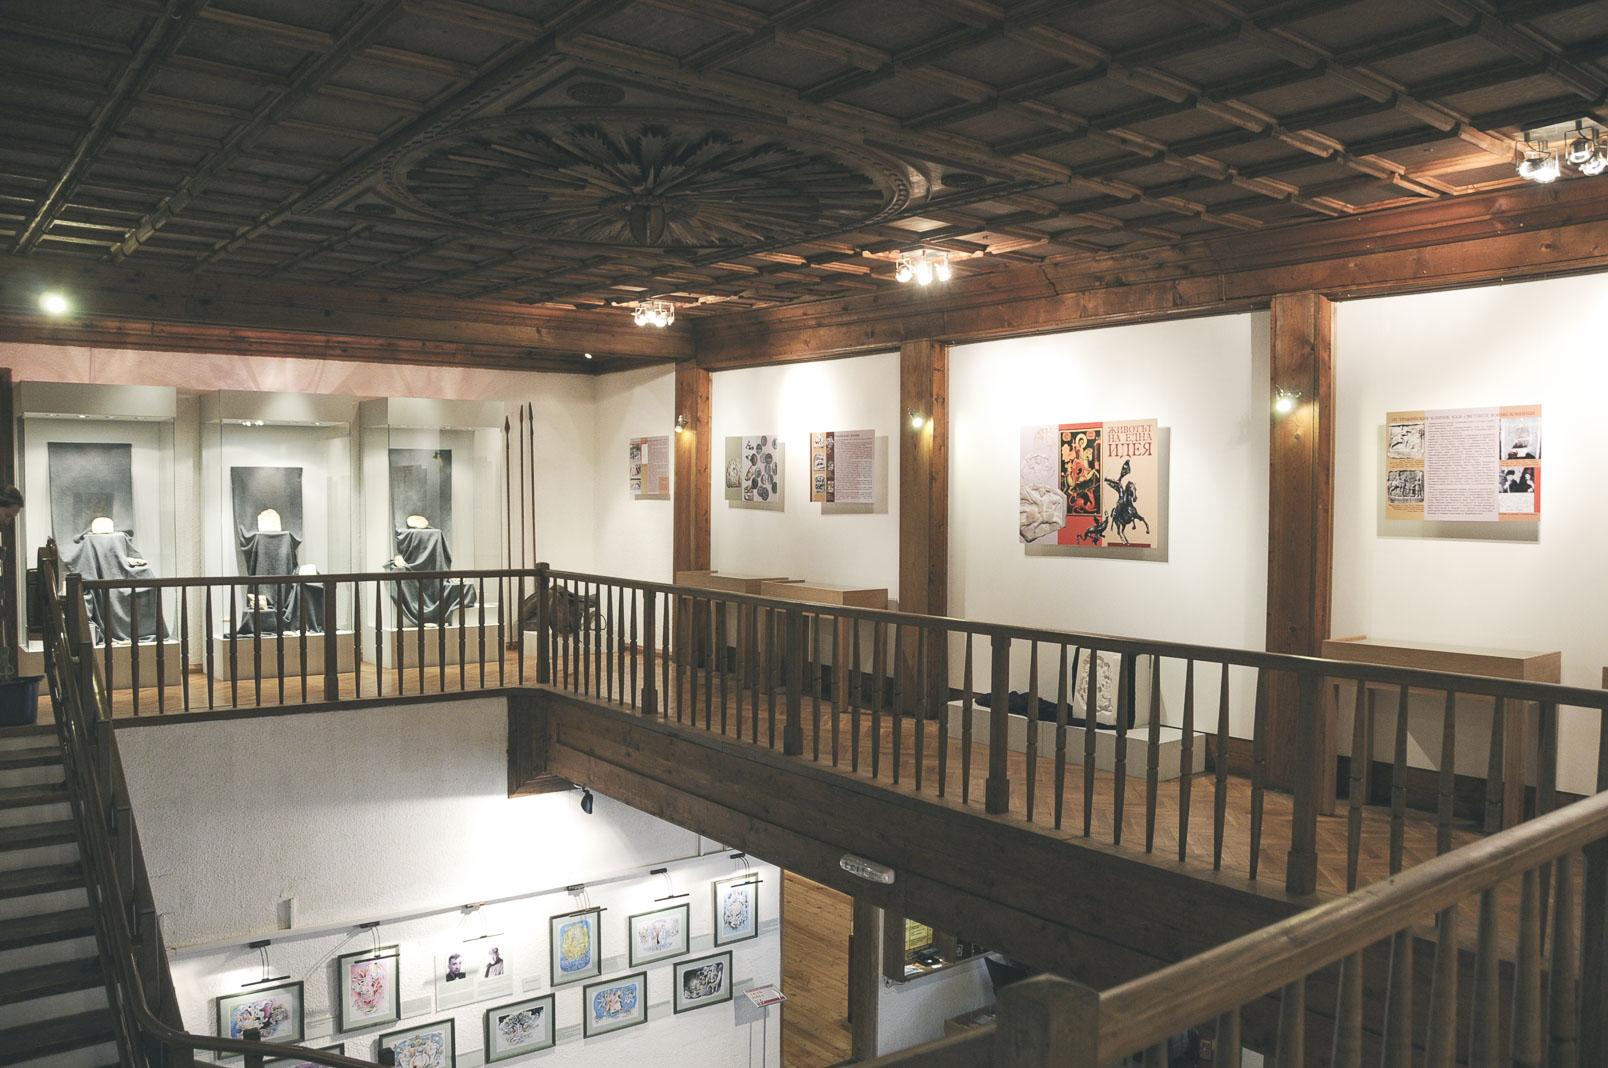 troyan-museum-jivotat-na-edna-idea-13